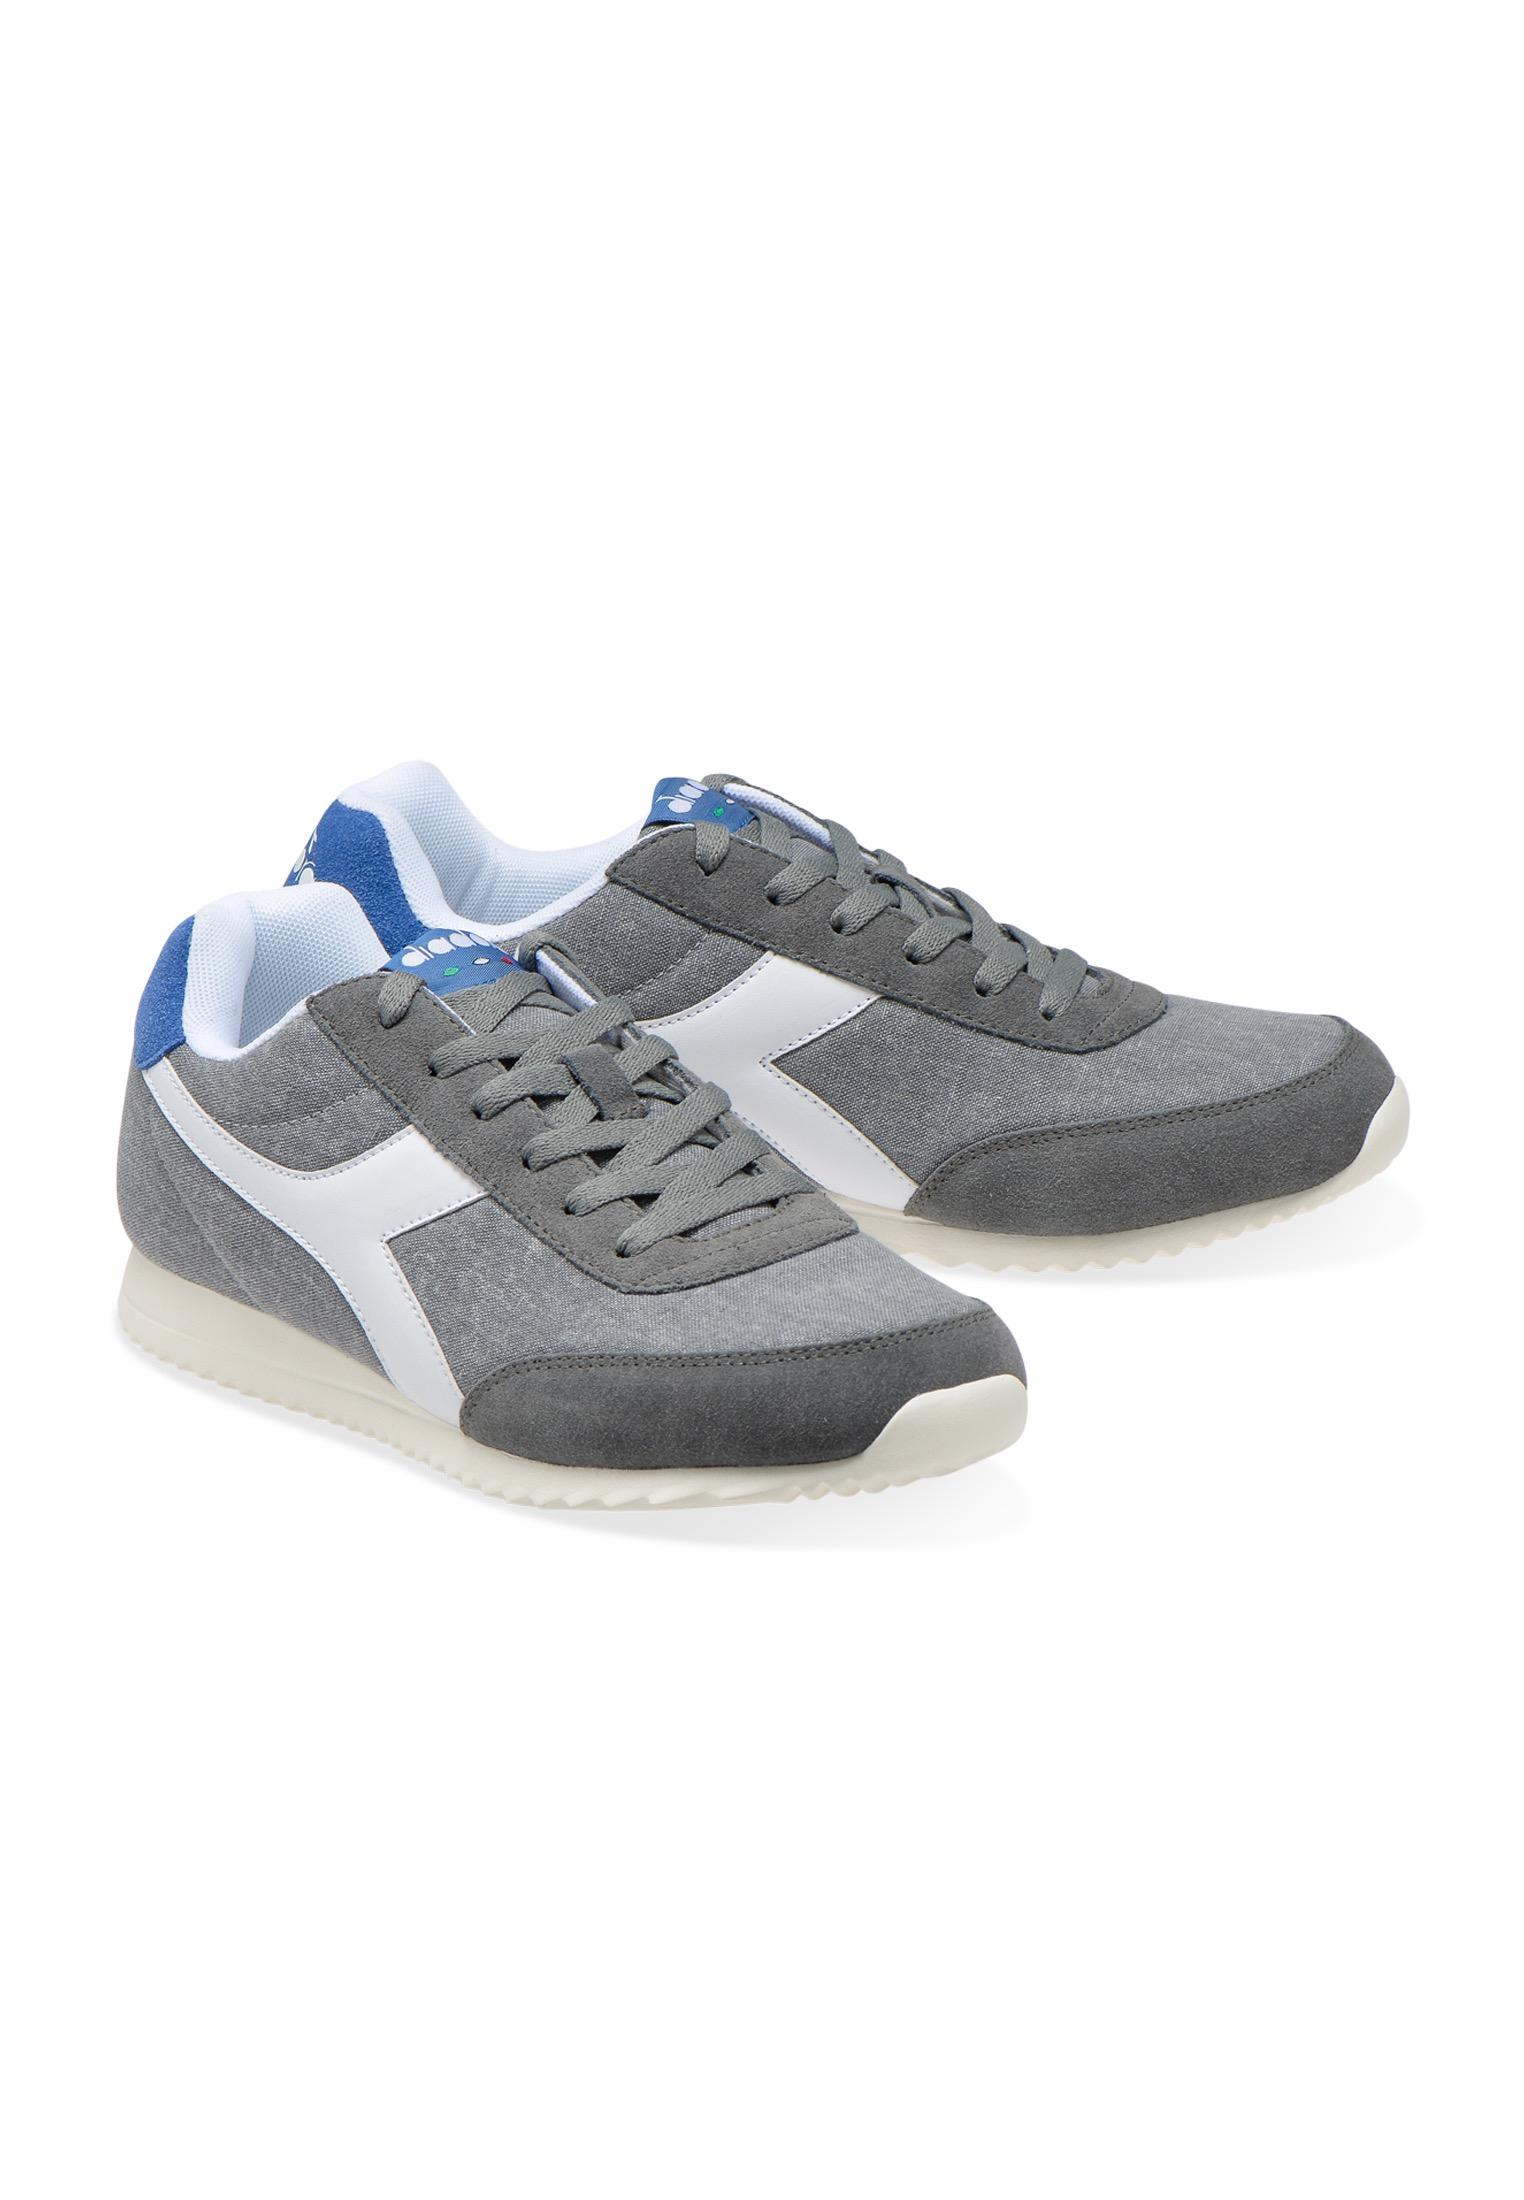 Scarpe-Diadora-Jog-Light-C-Sneakers-sportive-uomo-donna-vari-colori-e-taglie miniatura 71